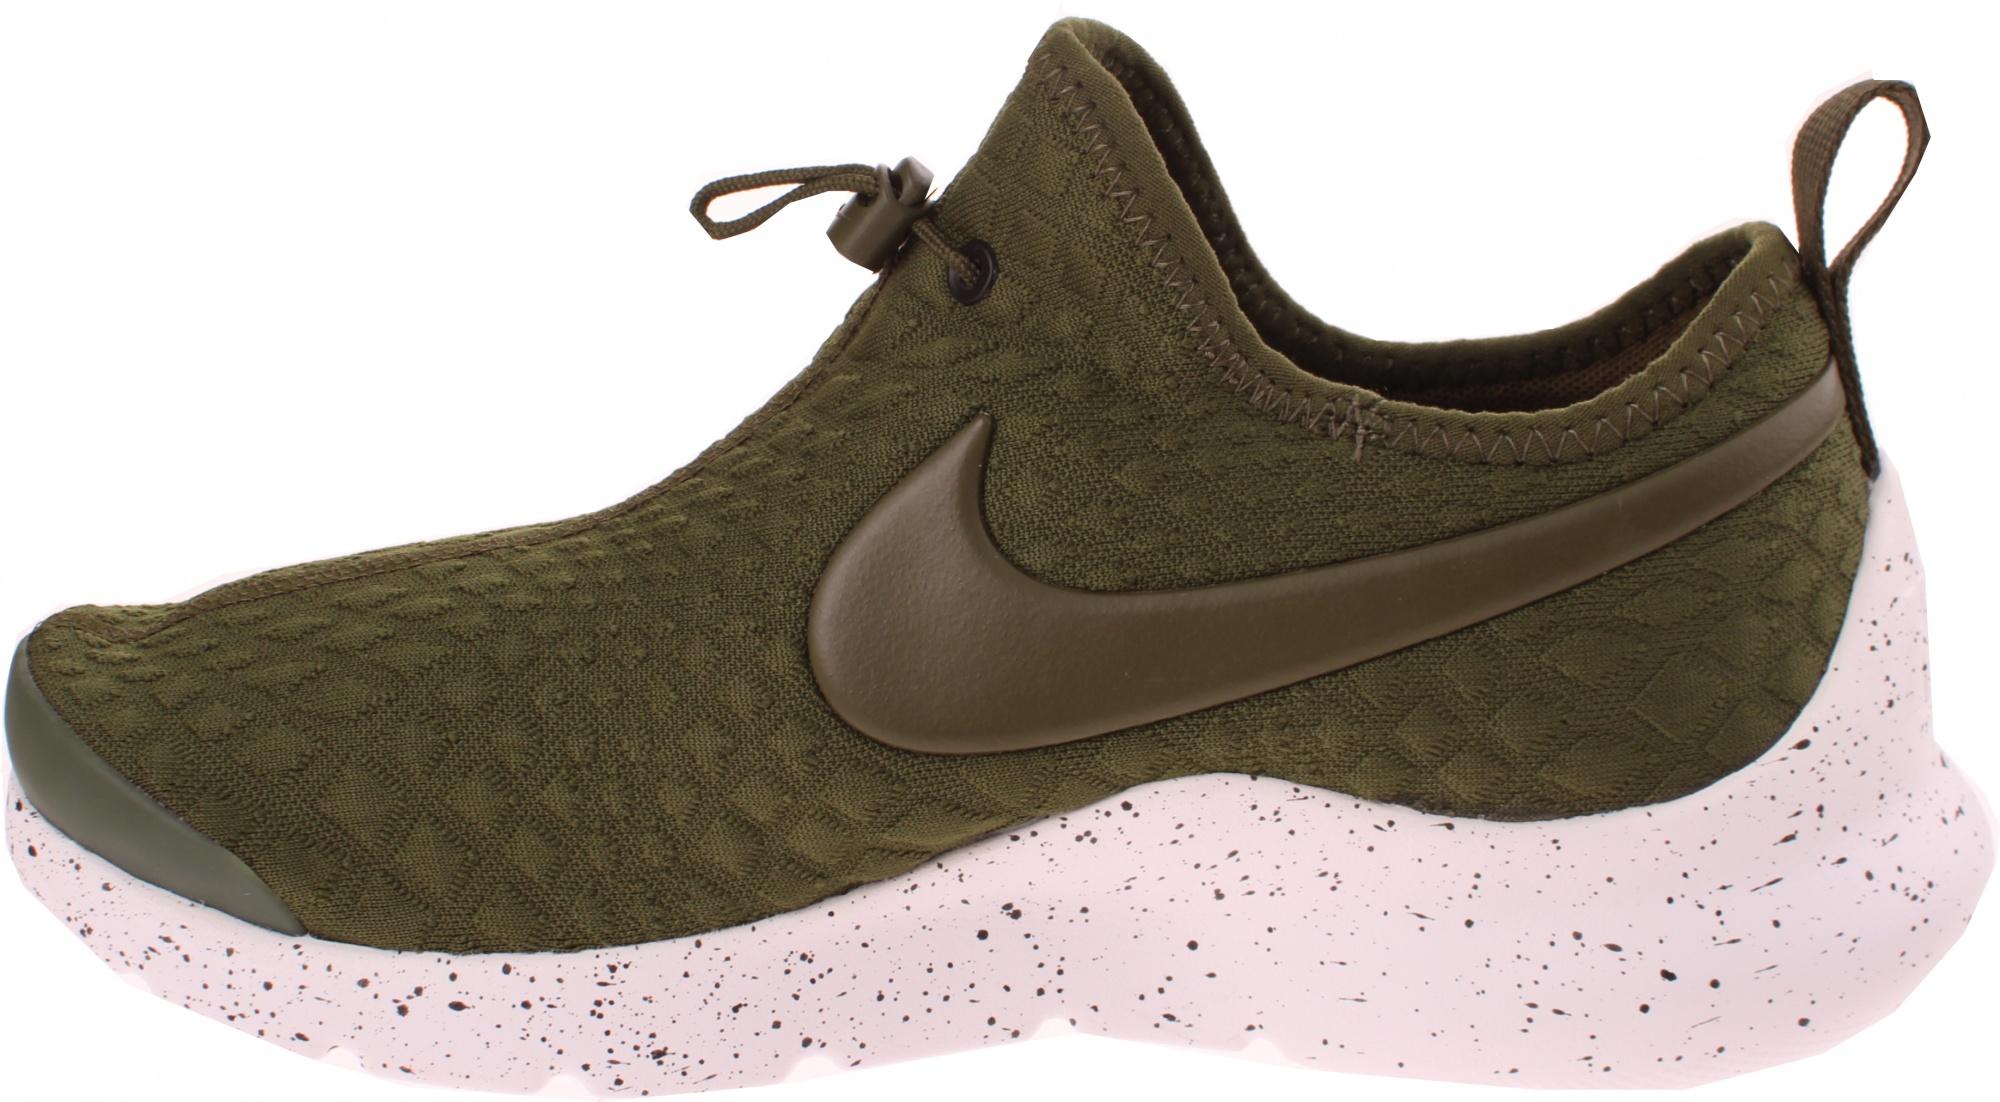 hot sale online 4069e 8220c Nike sneakers Aptare dames groen Nike sneakers Aptare dames groen ...